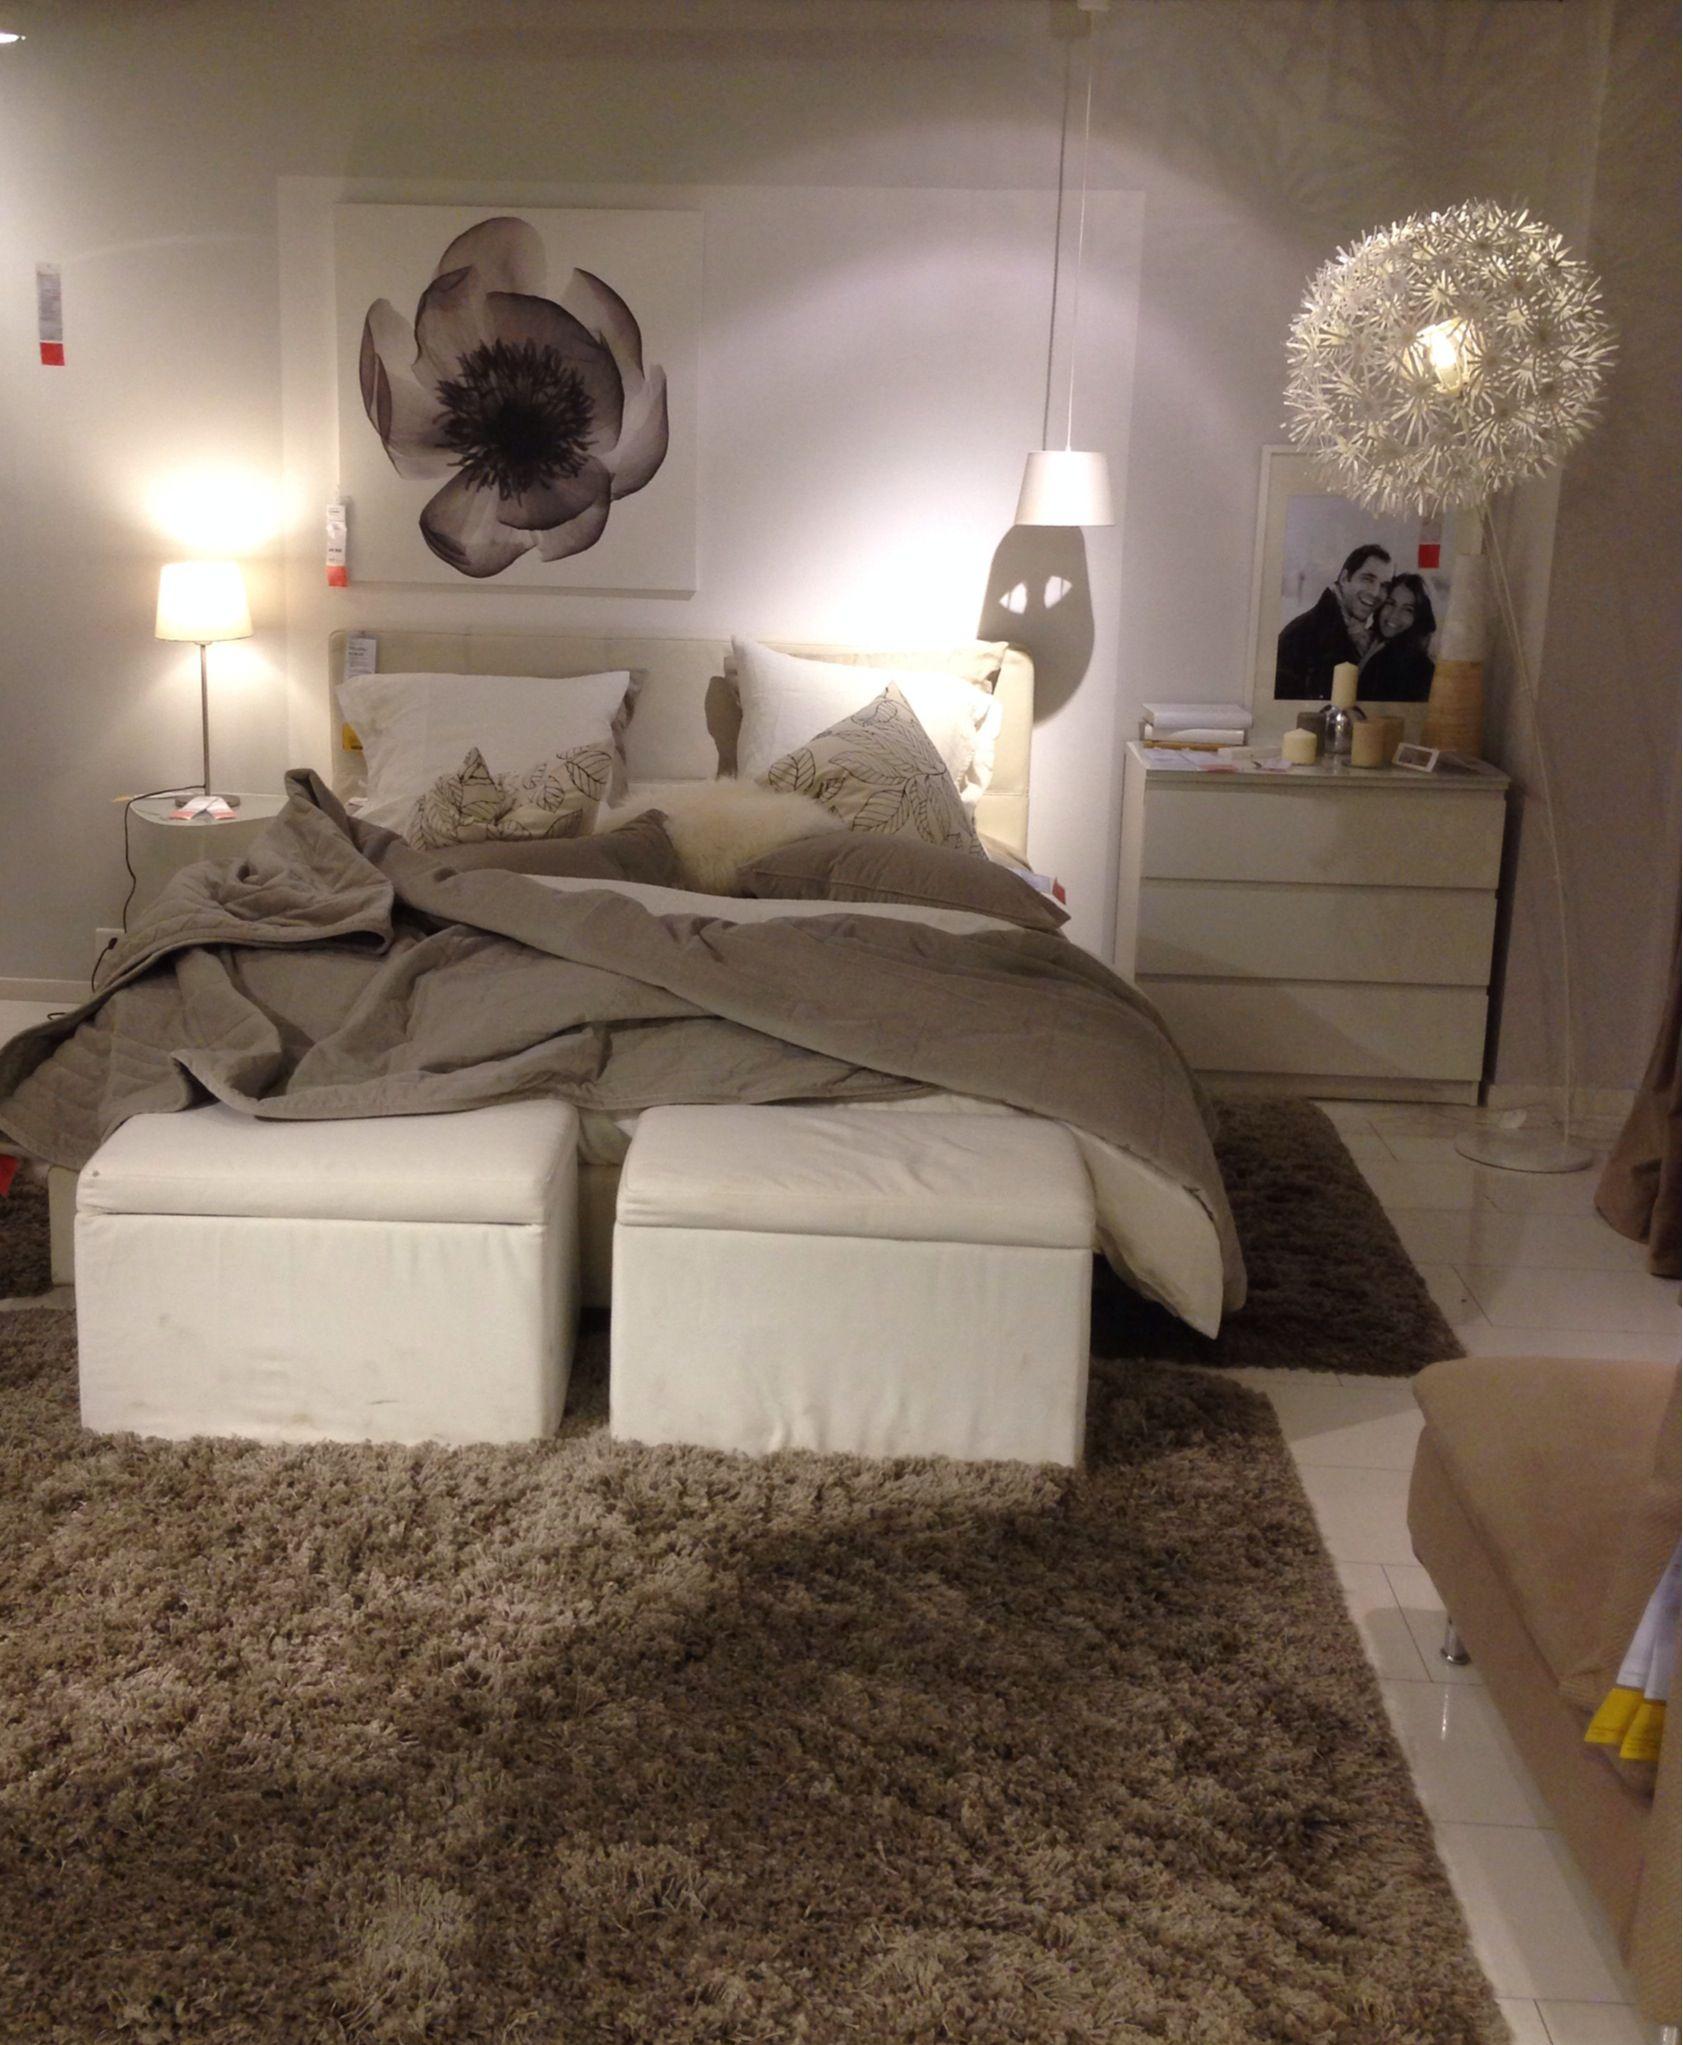 Ikea bedroom 5  White bedroom furniture ikea, White bedroom